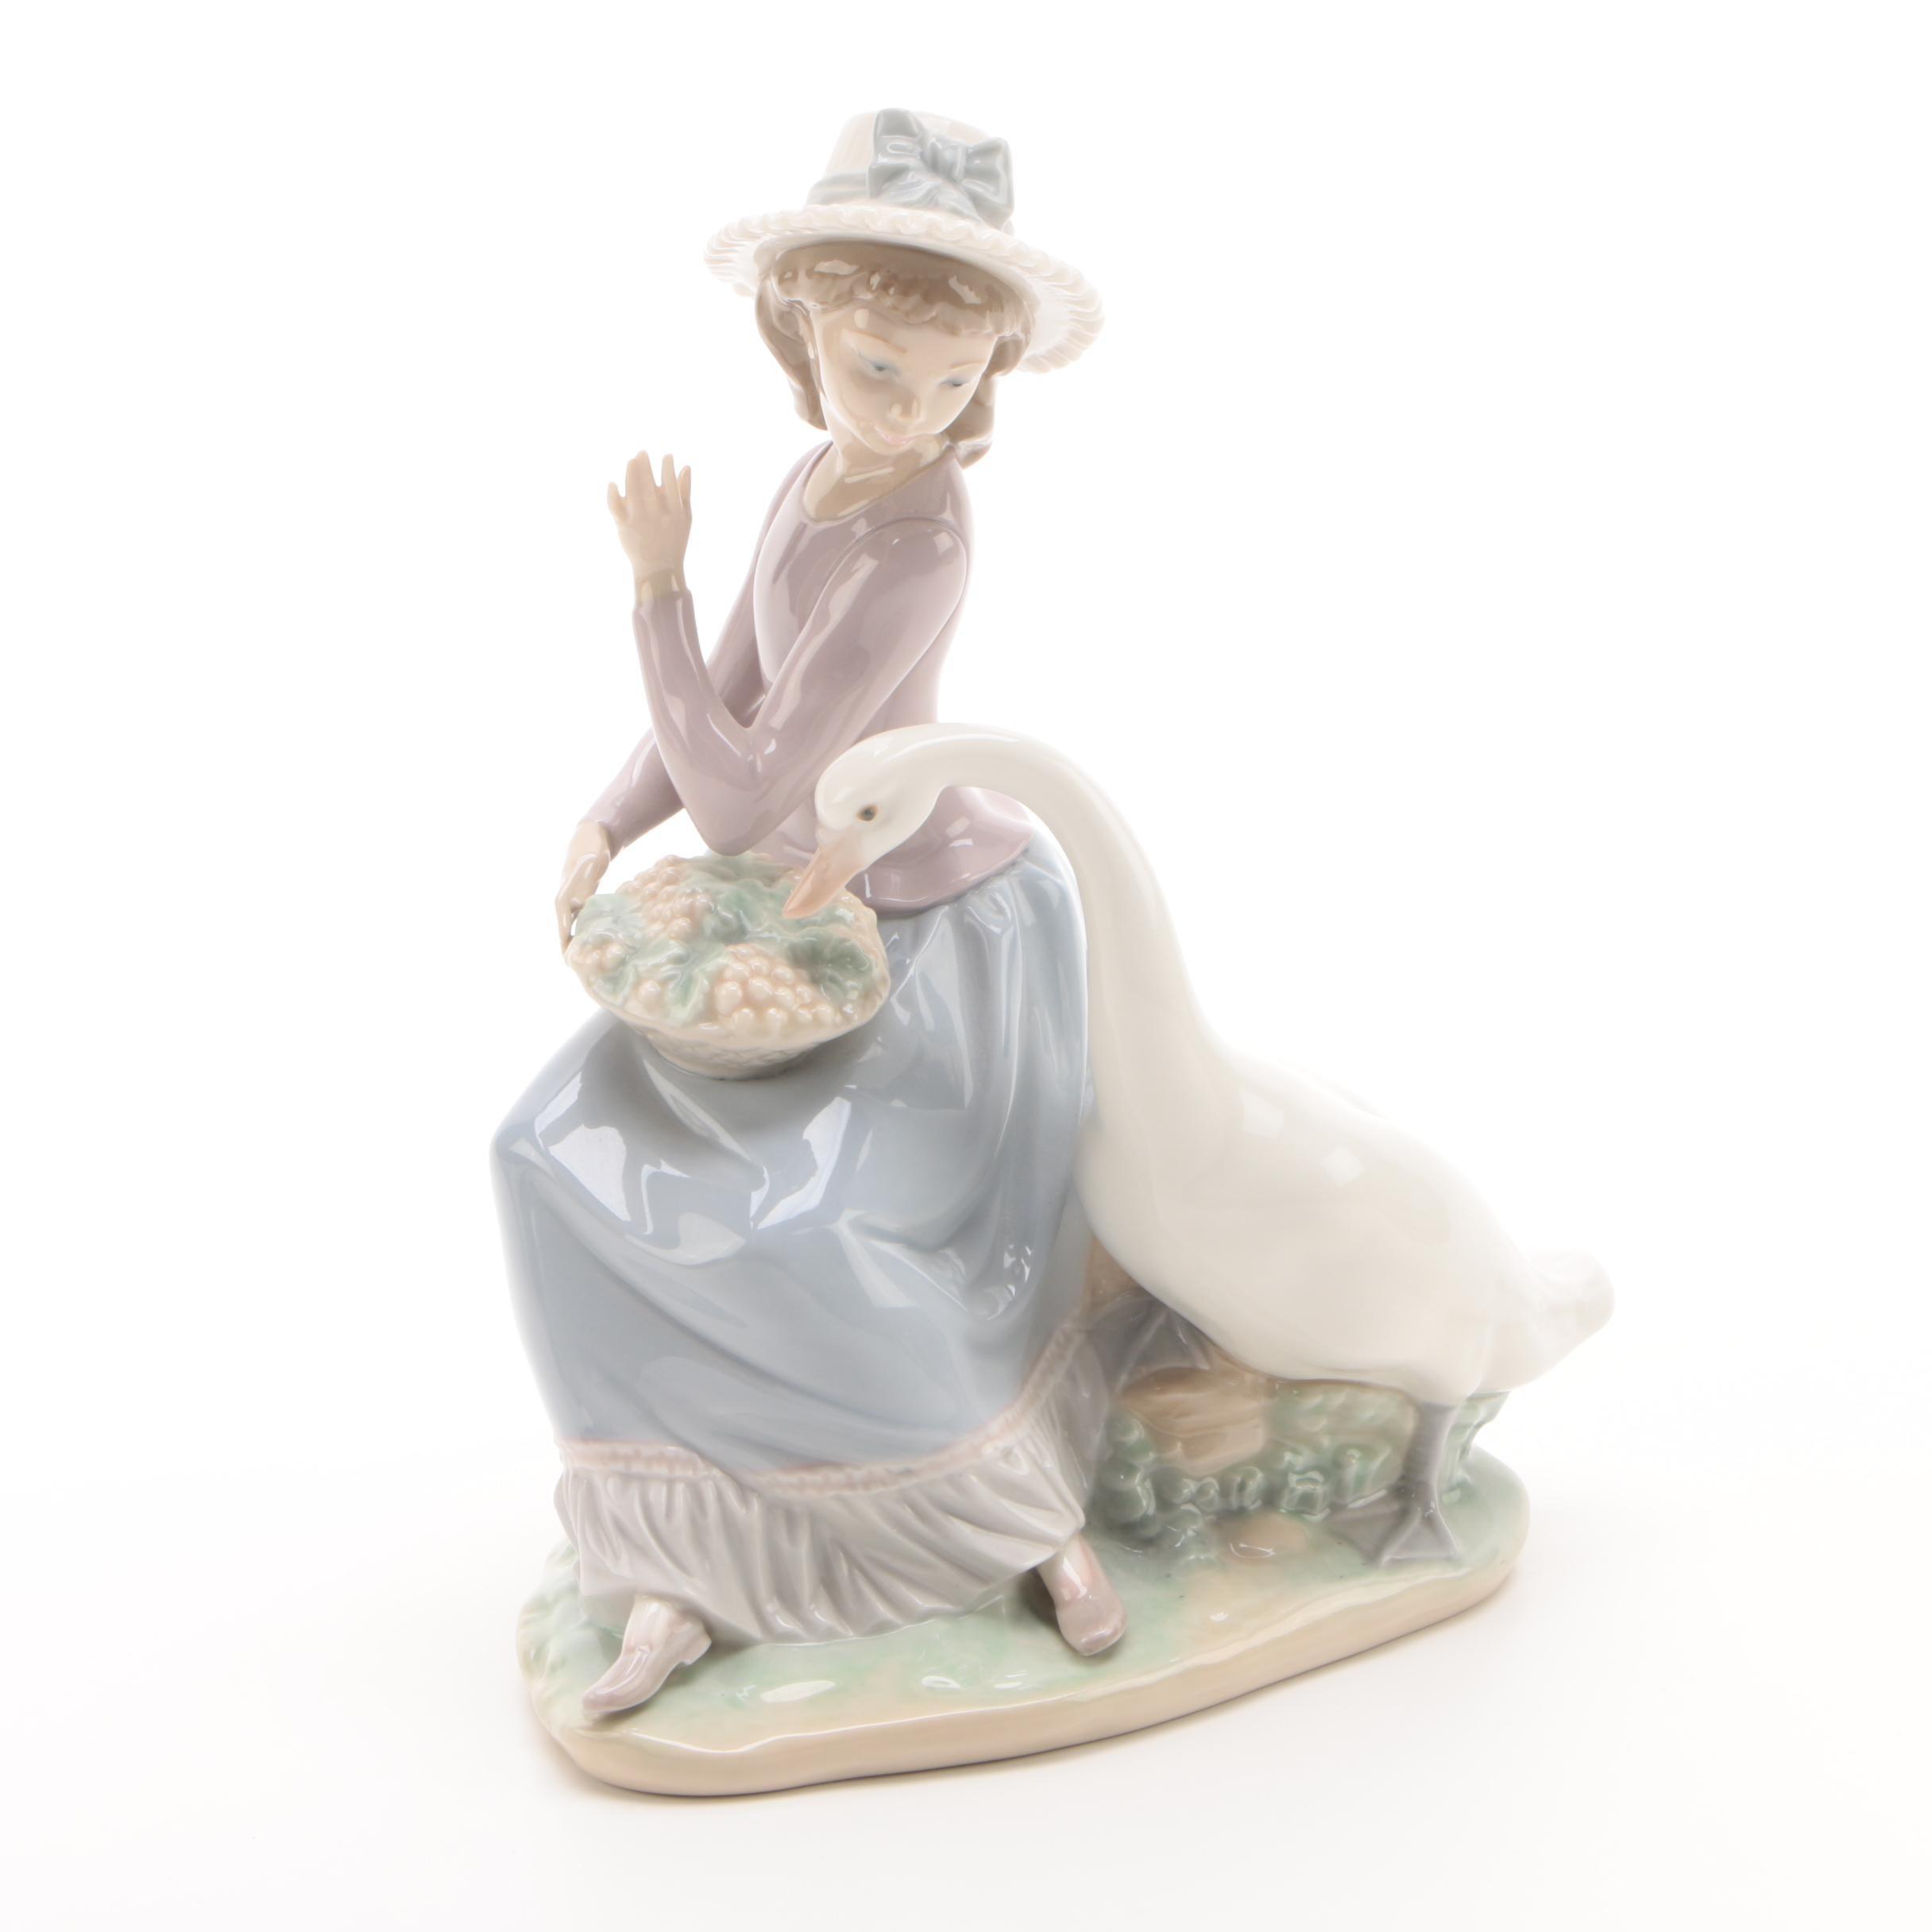 "Lladró ""Goose Trying To Eat"" Porcelain Figurine"